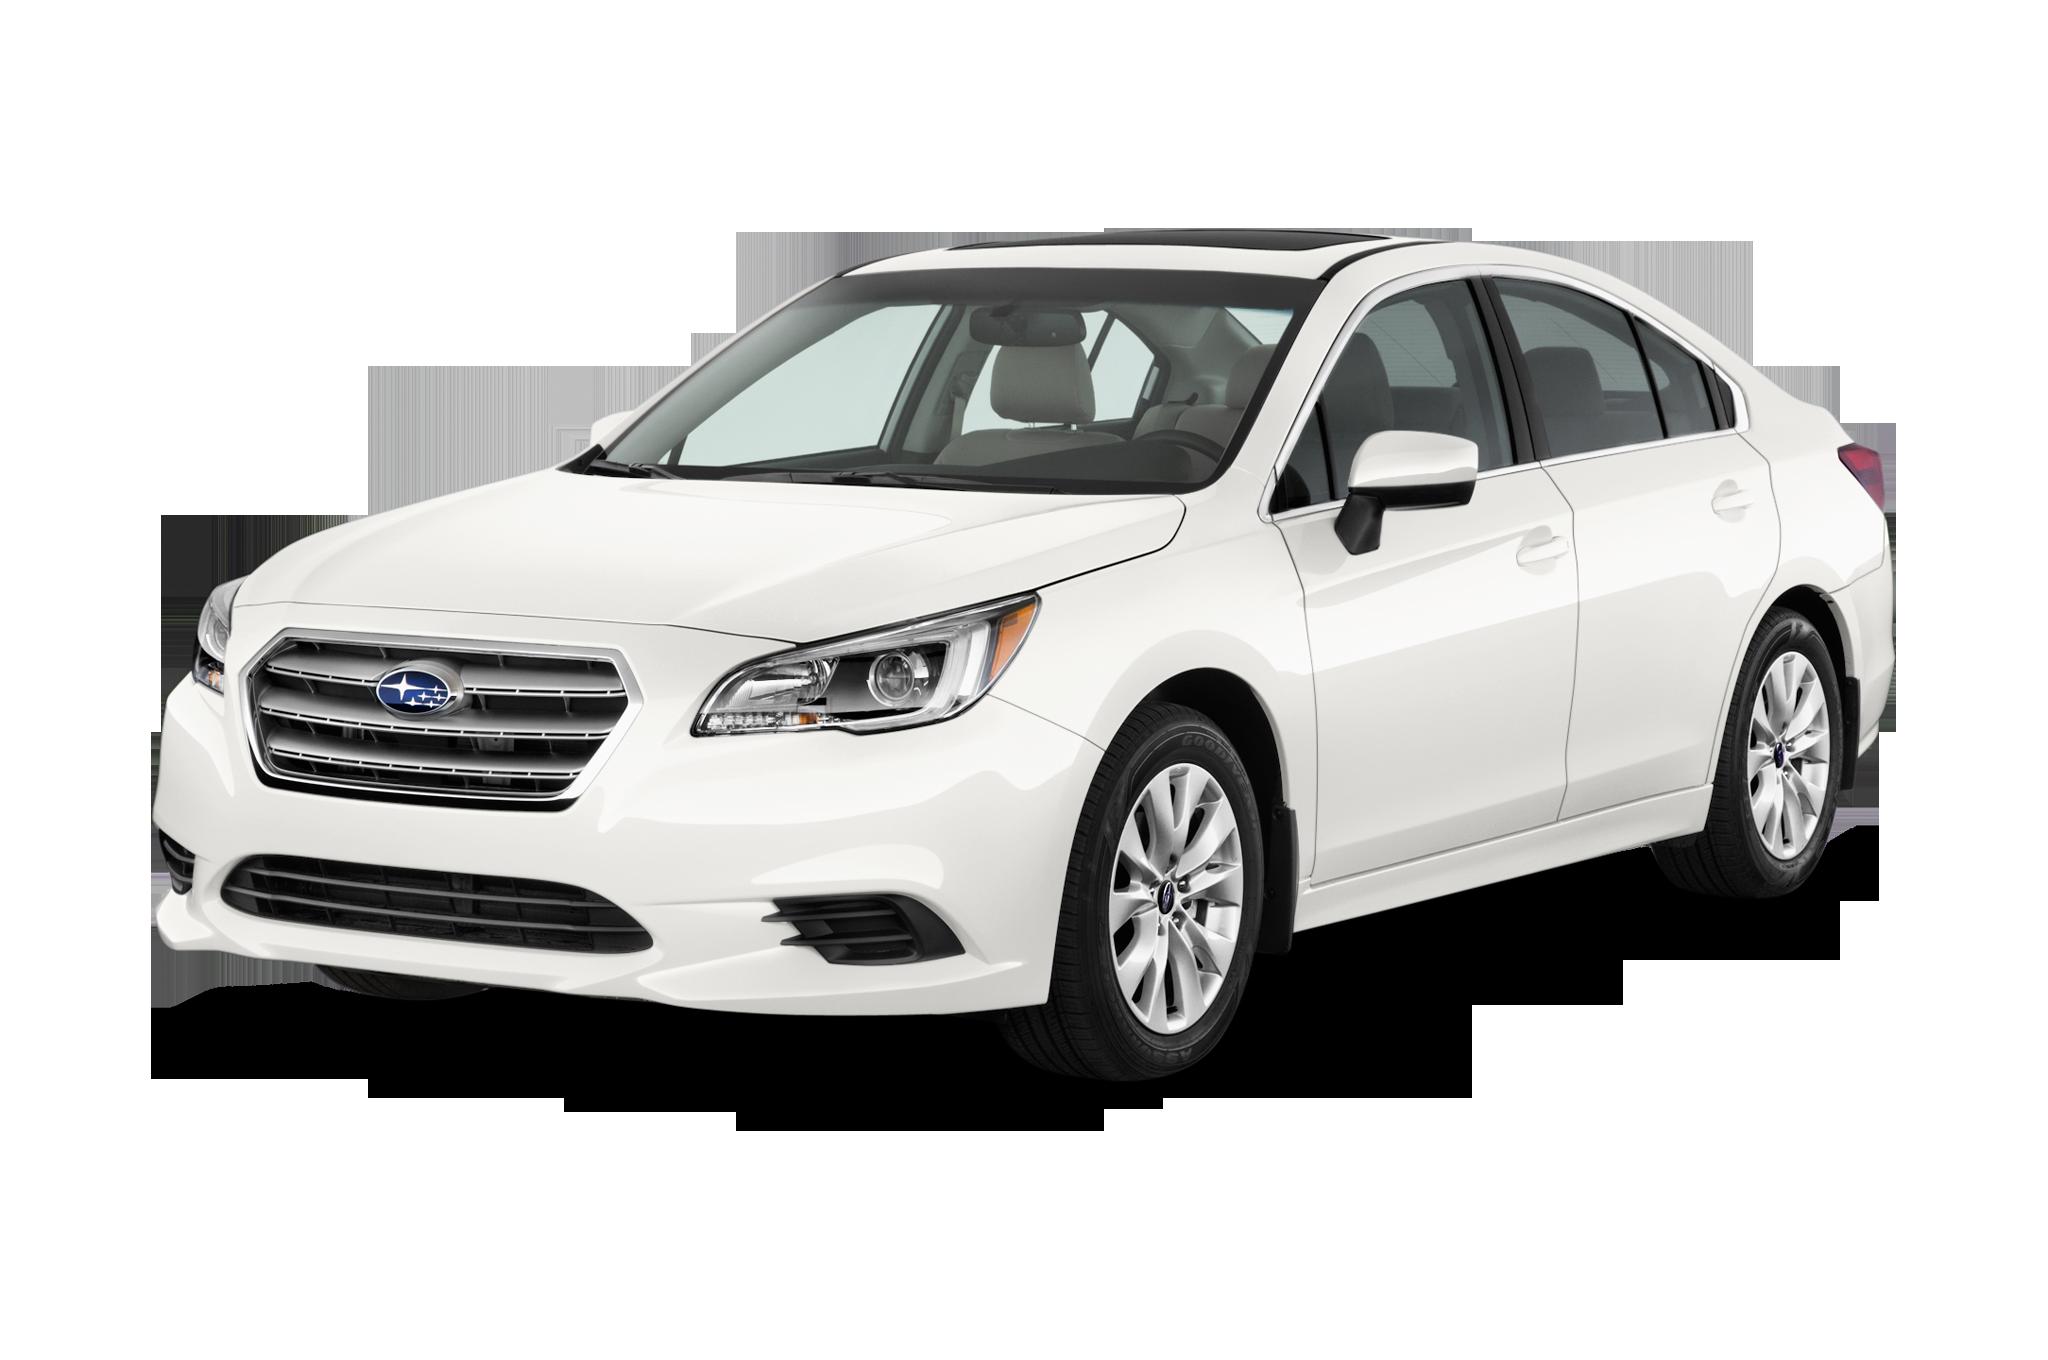 Subaru Legacy Reviews And Rating Motor Trend - 2018 subaru legacy invoice price